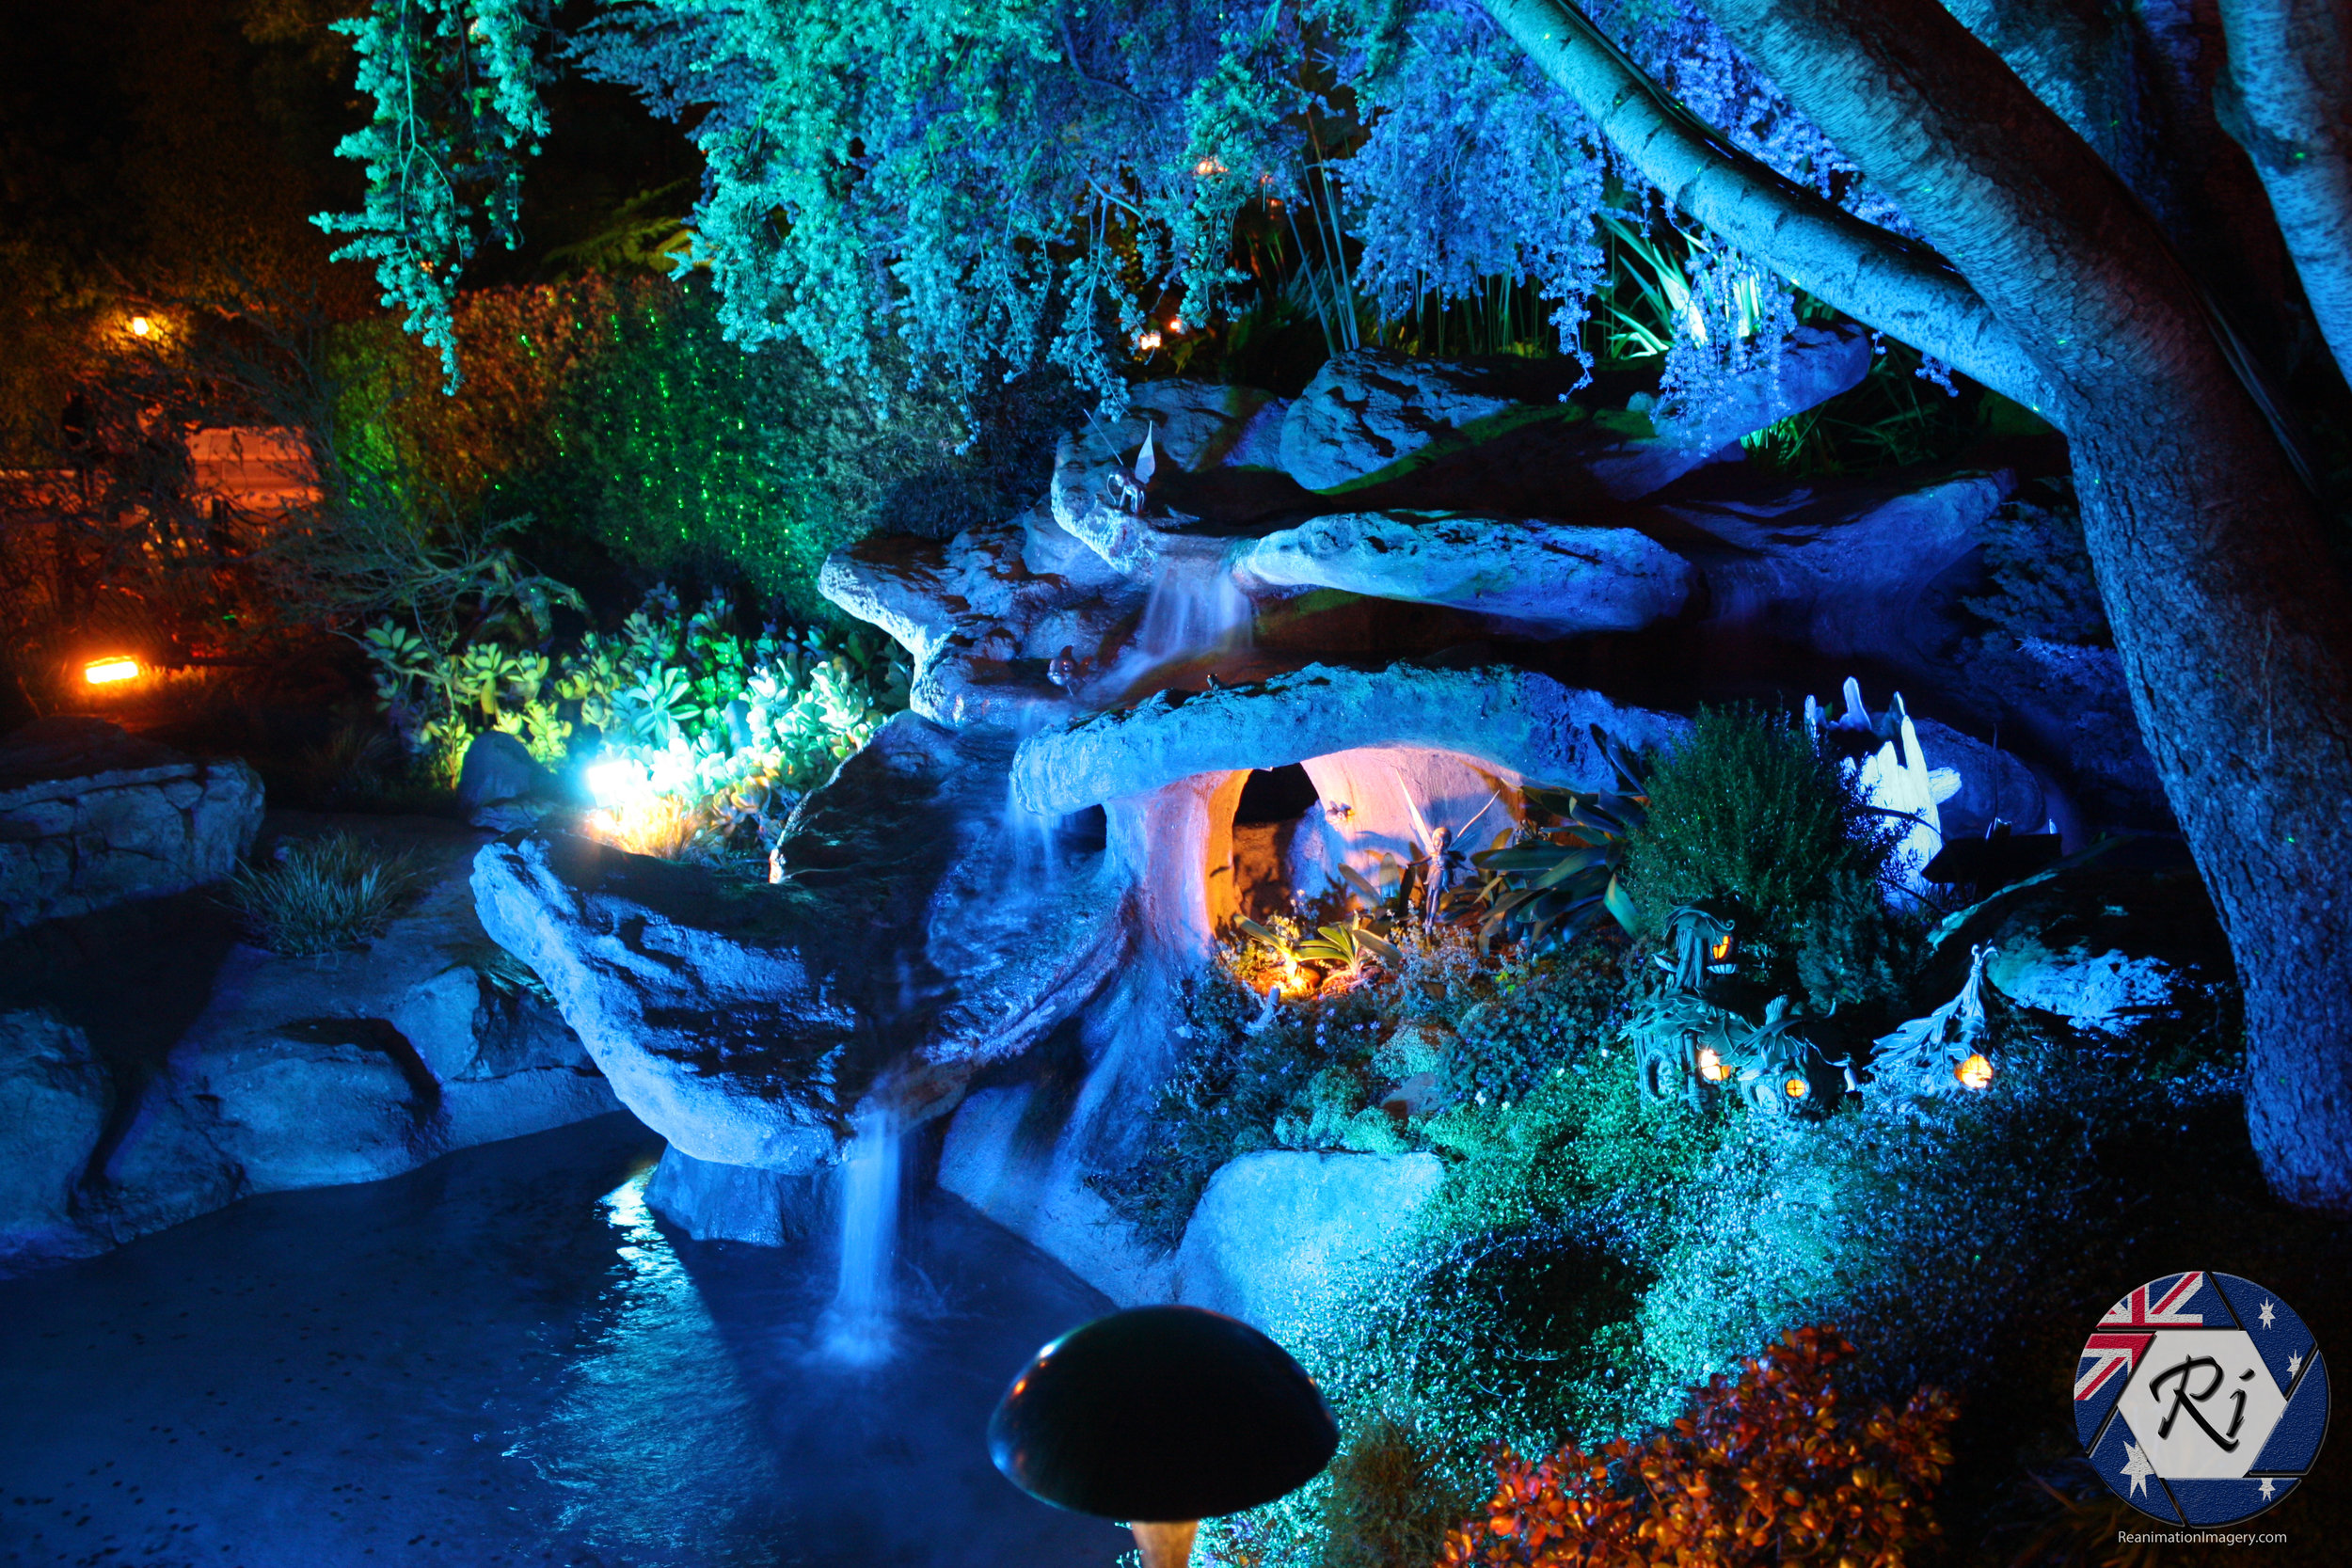 stock-photo-pixie-garden-75421085.jpg